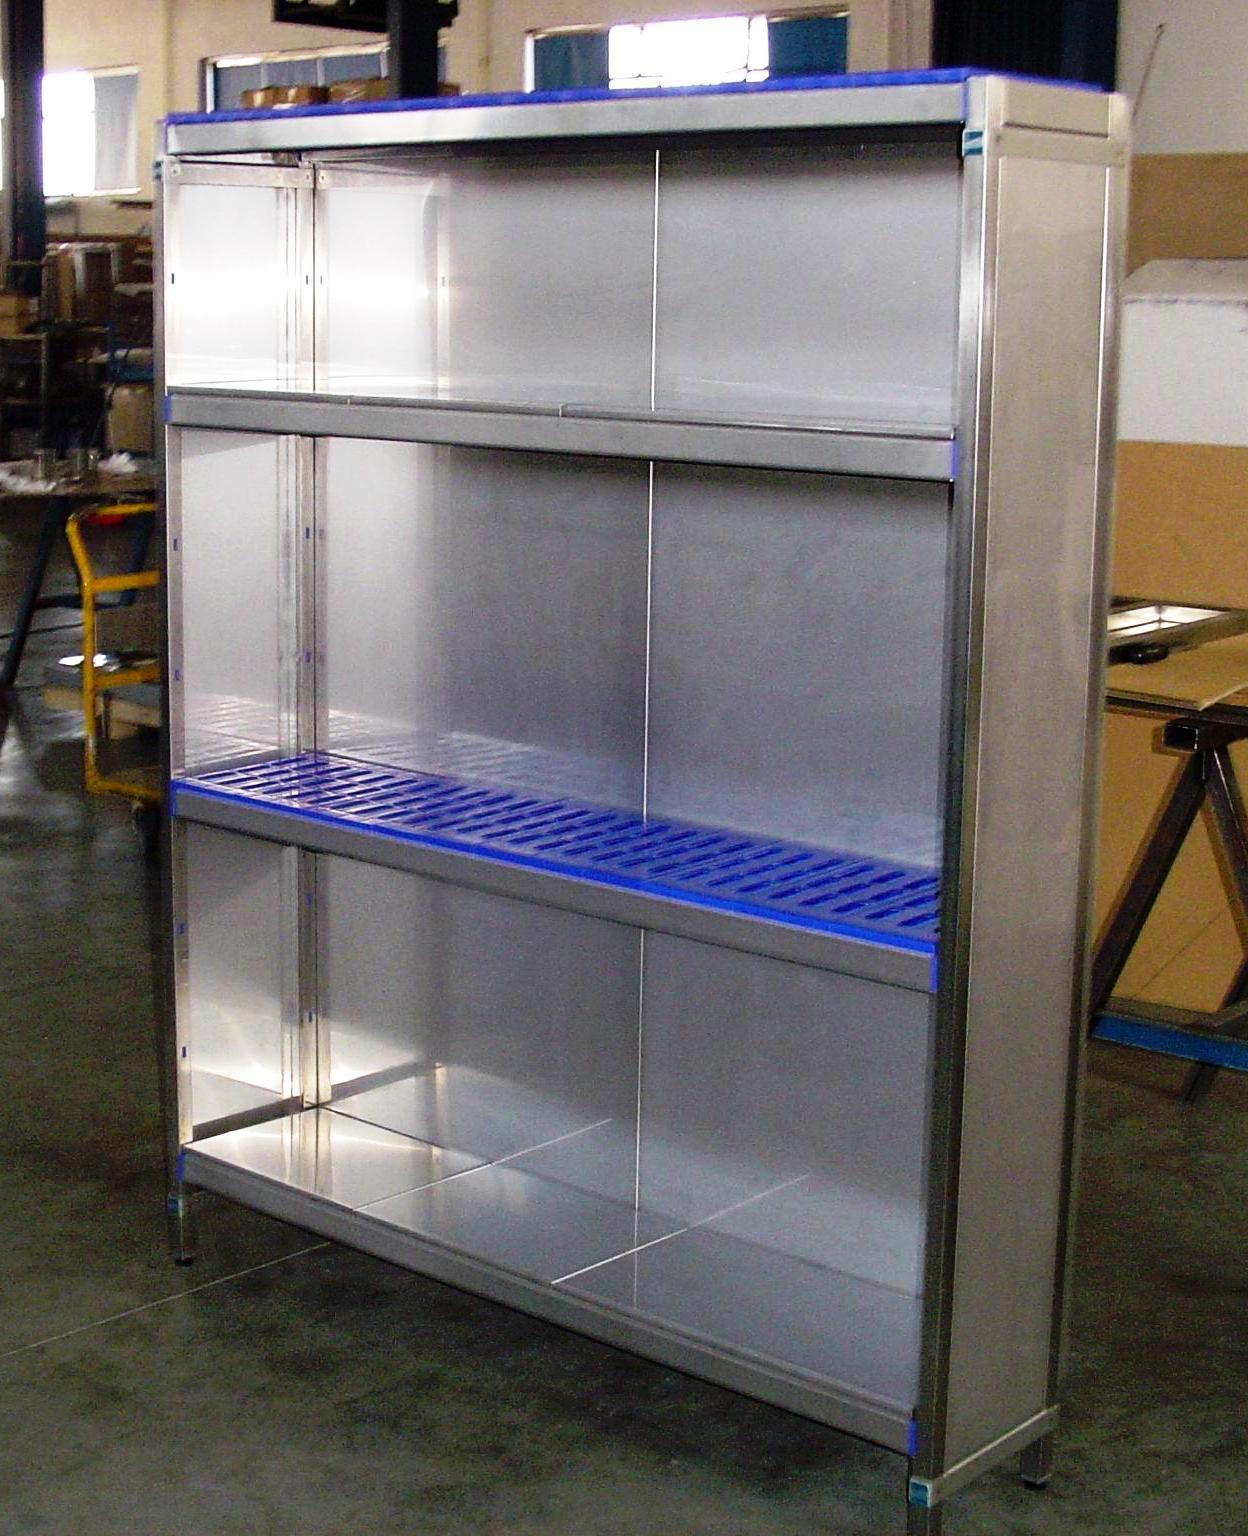 estanterias de acero inoxidable con estante liso o perforado